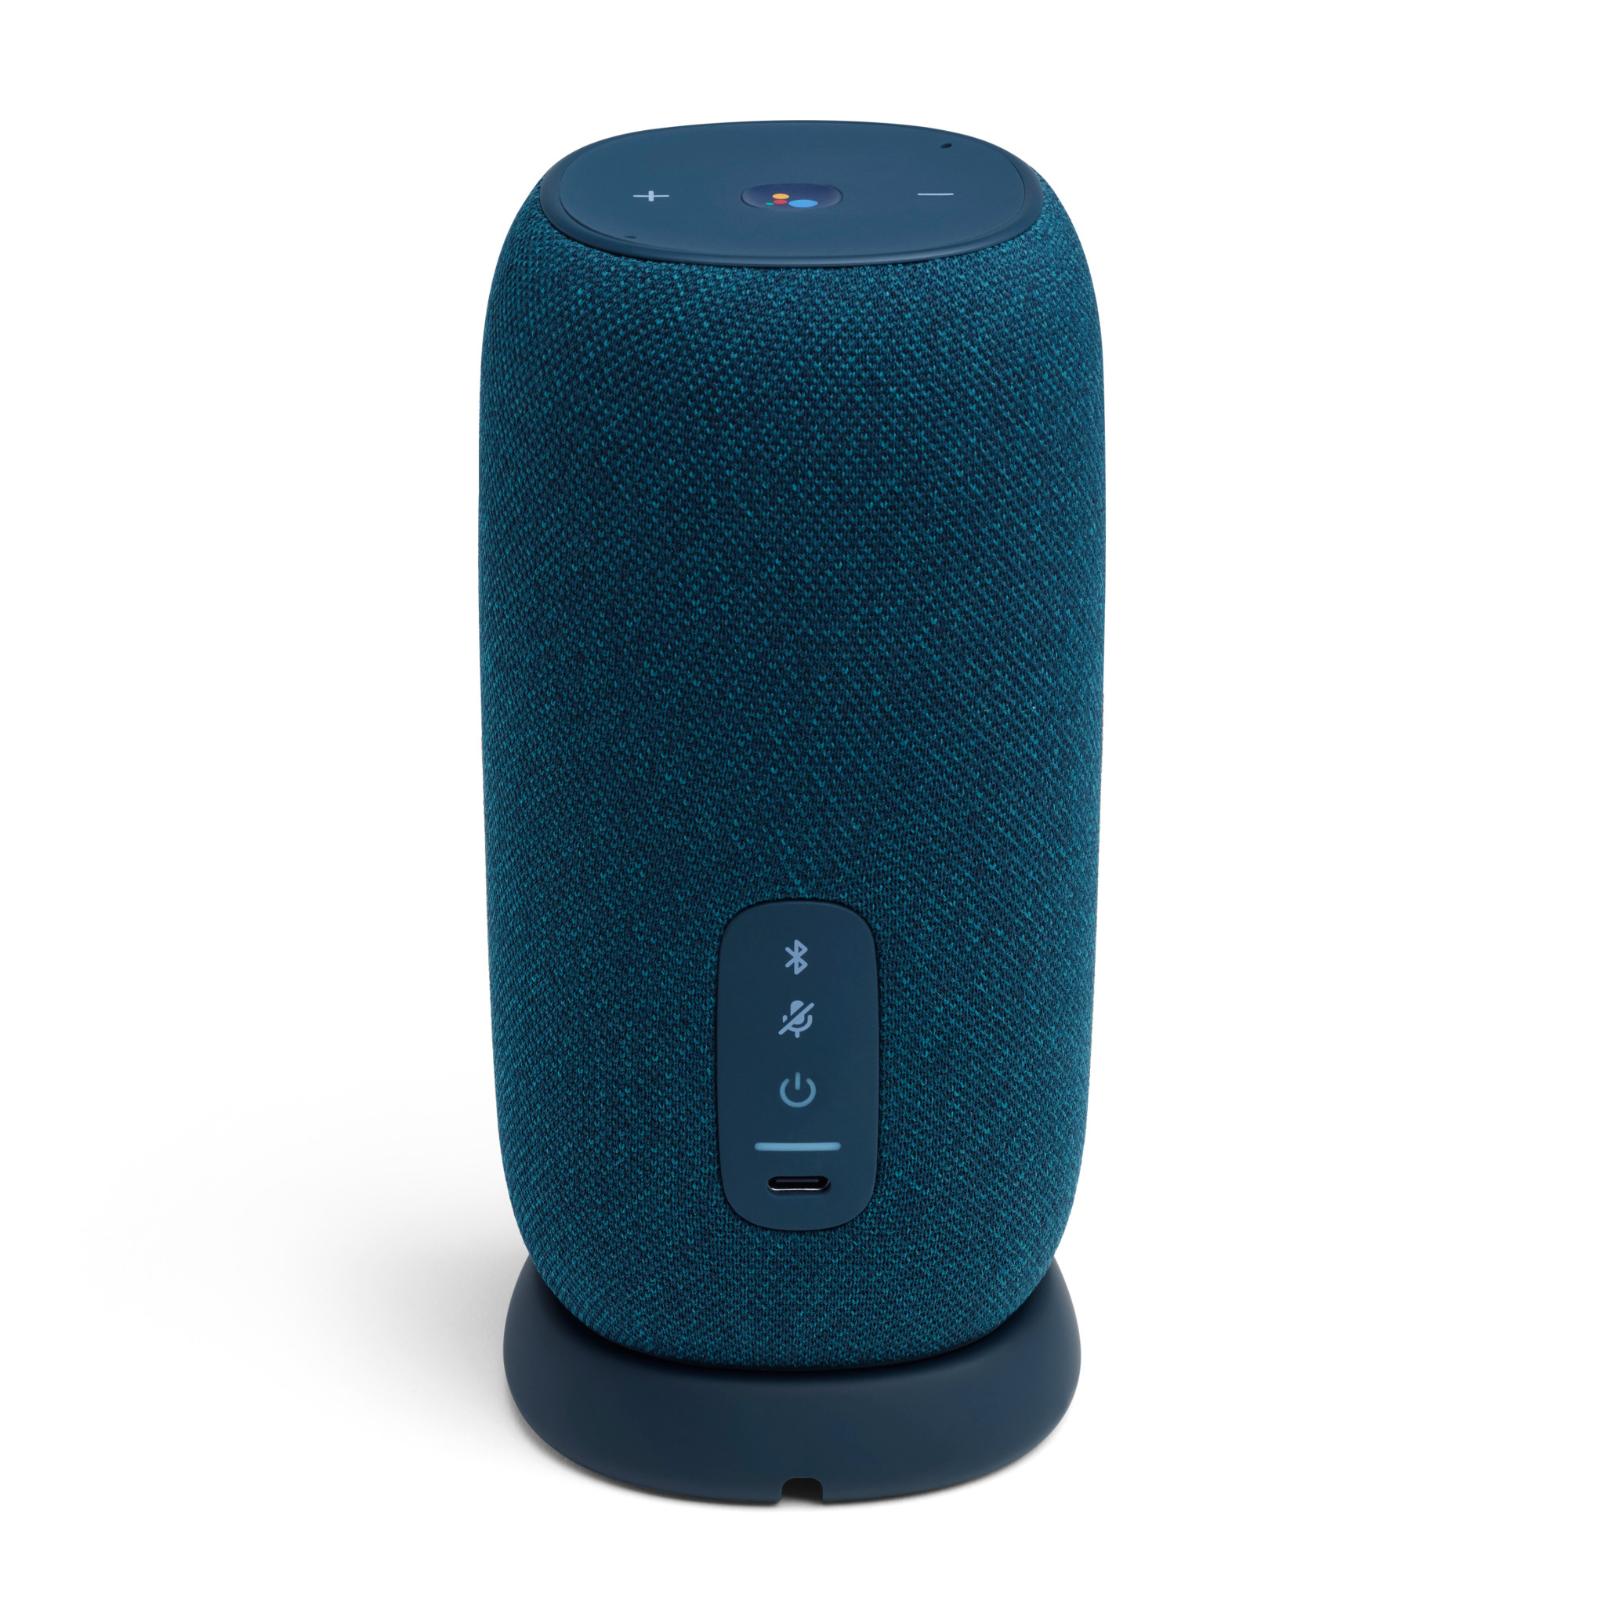 JBL Link Portable - Blue - Portable Wi-Fi Speaker - Back